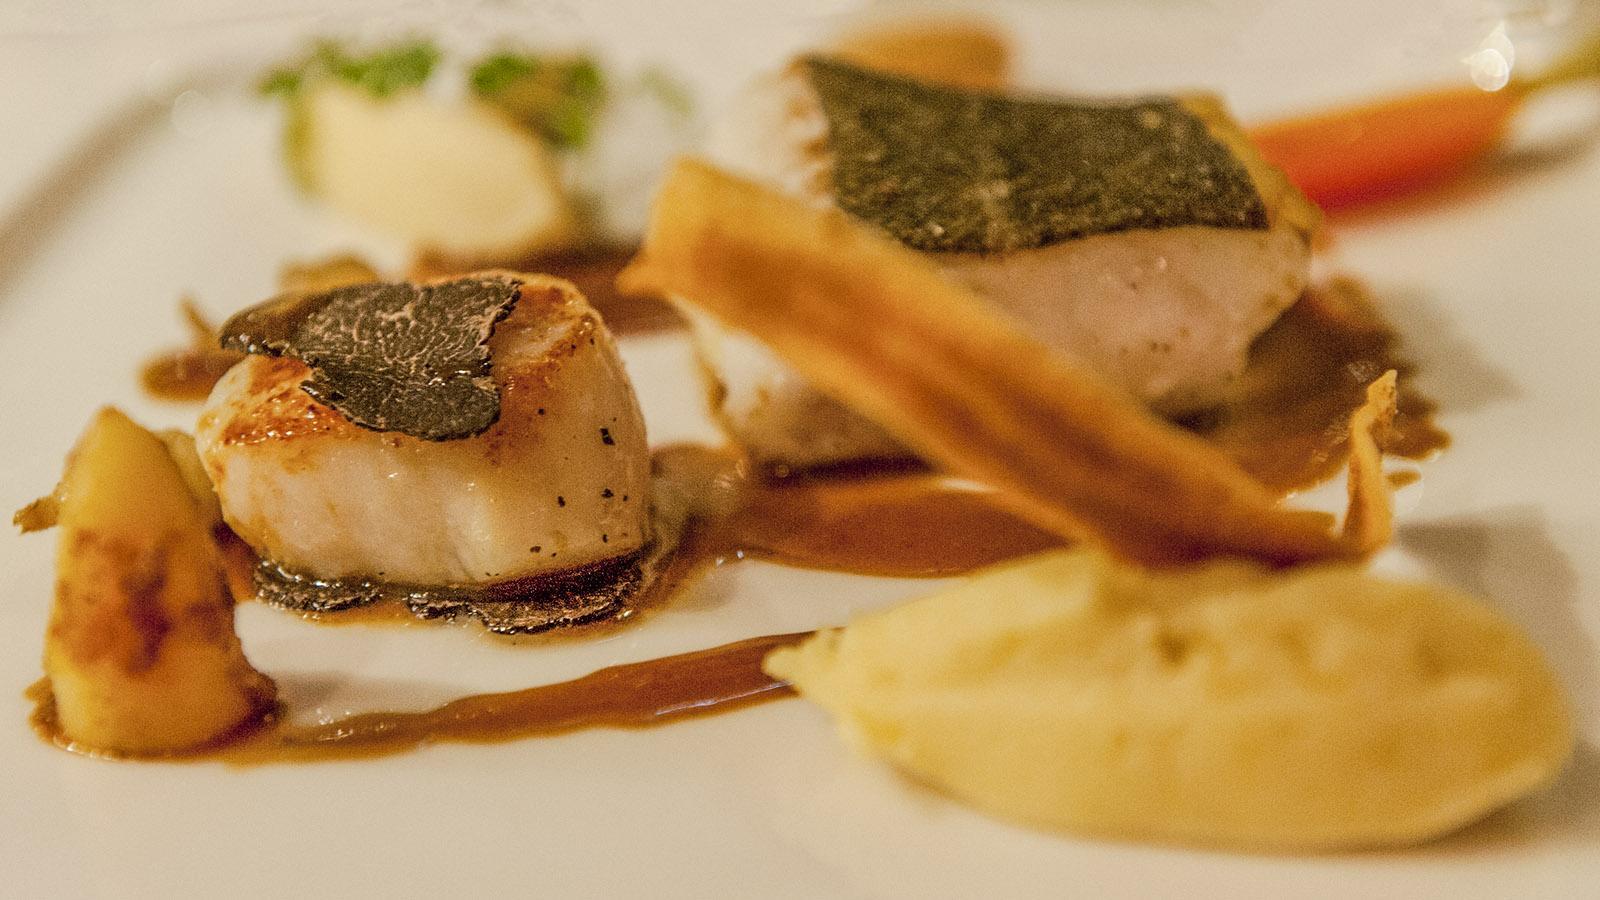 Sterneverdächtig: Die Küche von Aux Confins des Sens in Le Grand Bornand. Foto. Hilke Maunder